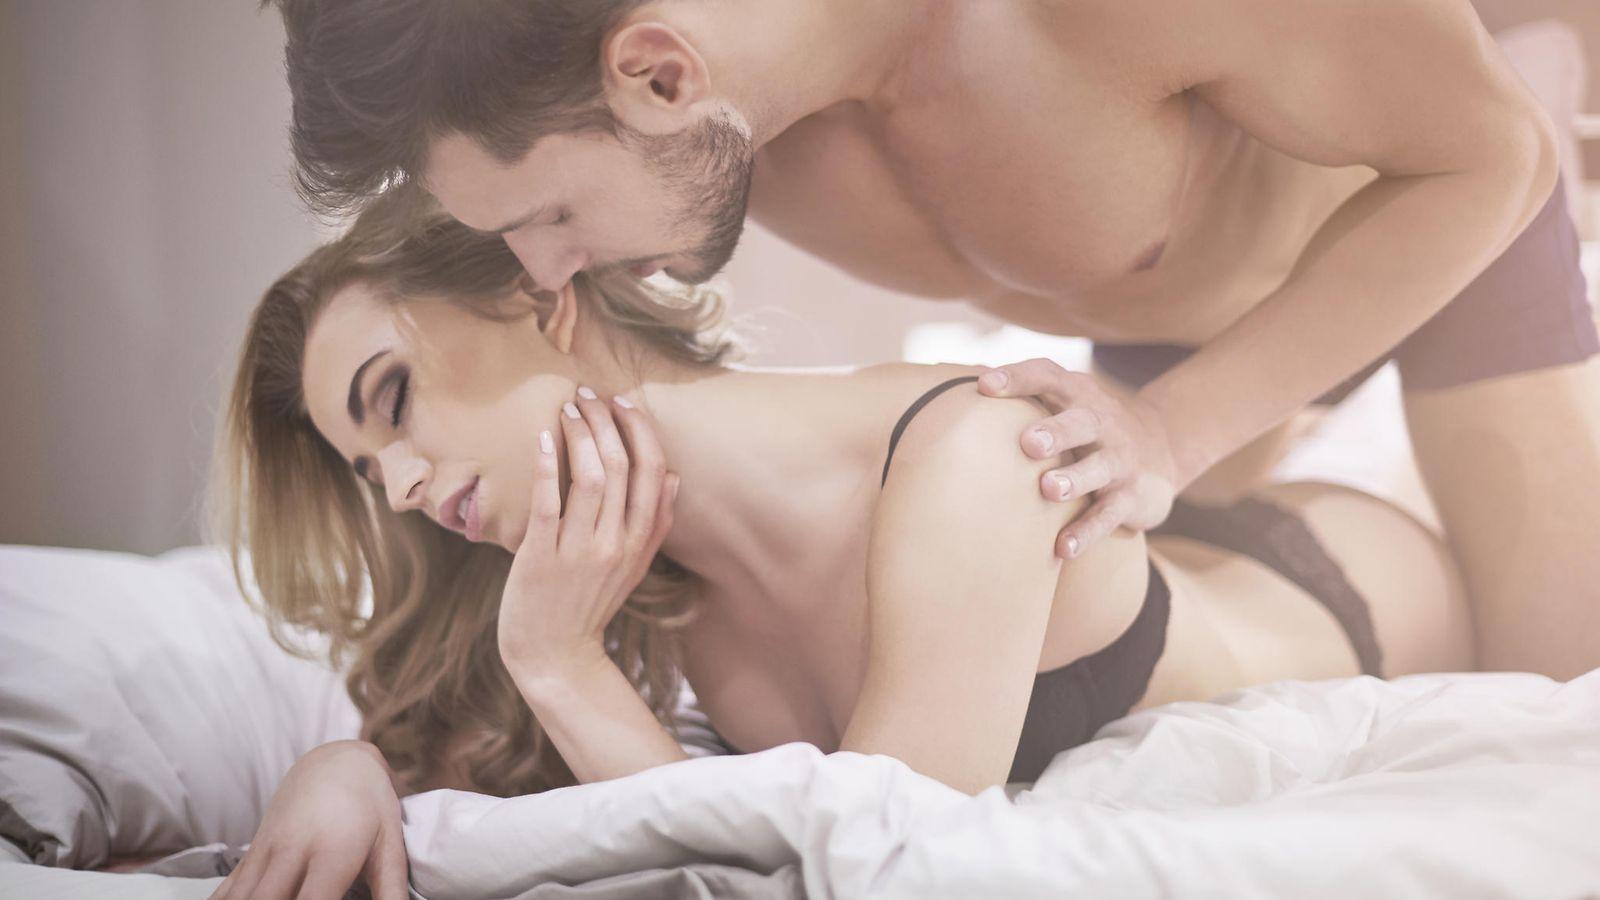 seksi novelli nainen etsii mies